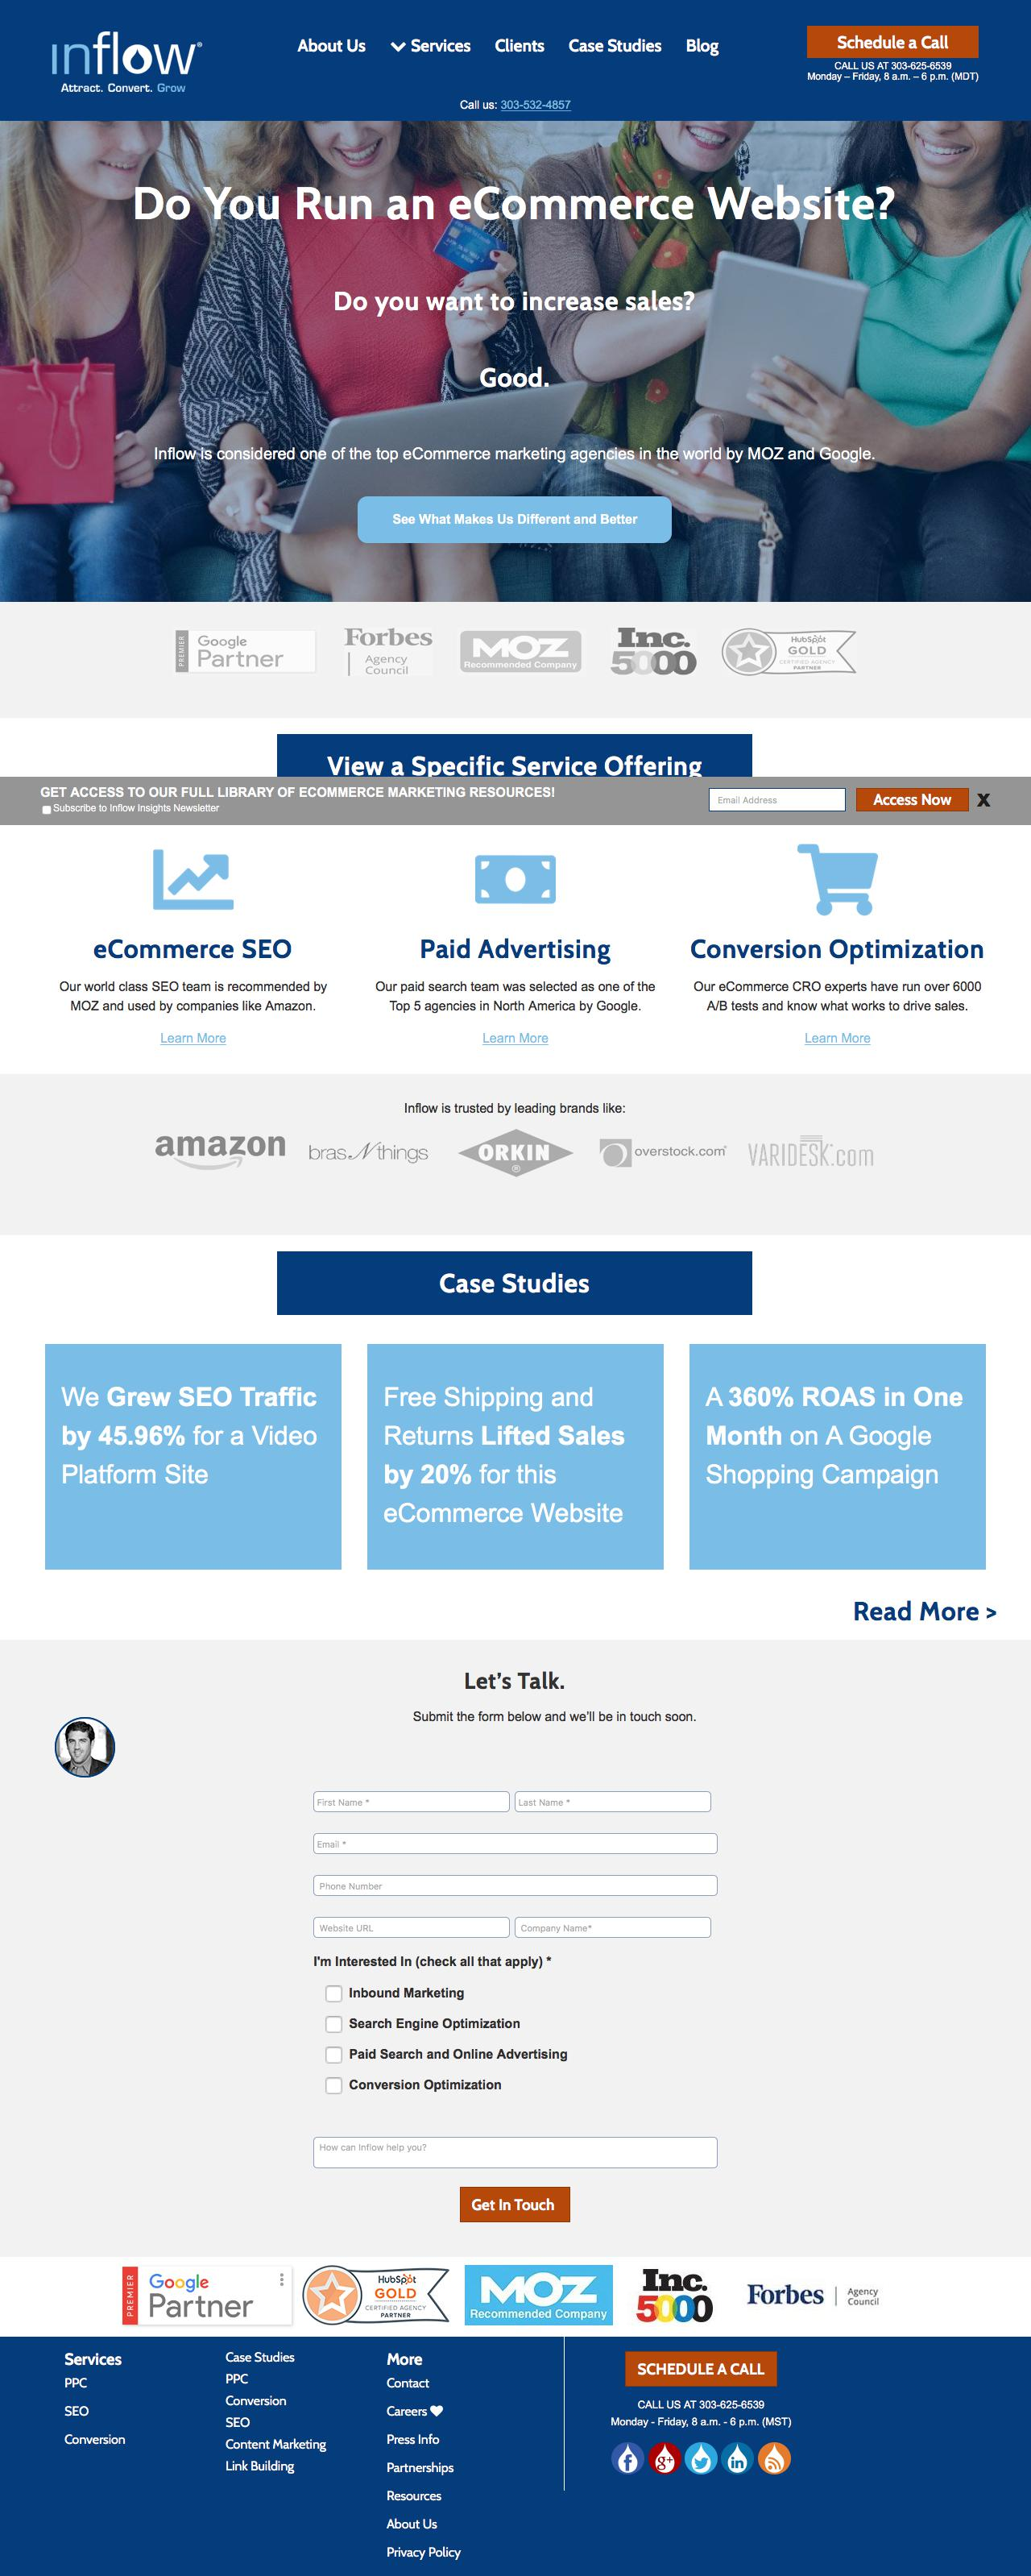 Screenshot of goinflow.com - Award-Winning eCommerce Marketing Agency | Inflow - captured June 21, 2018